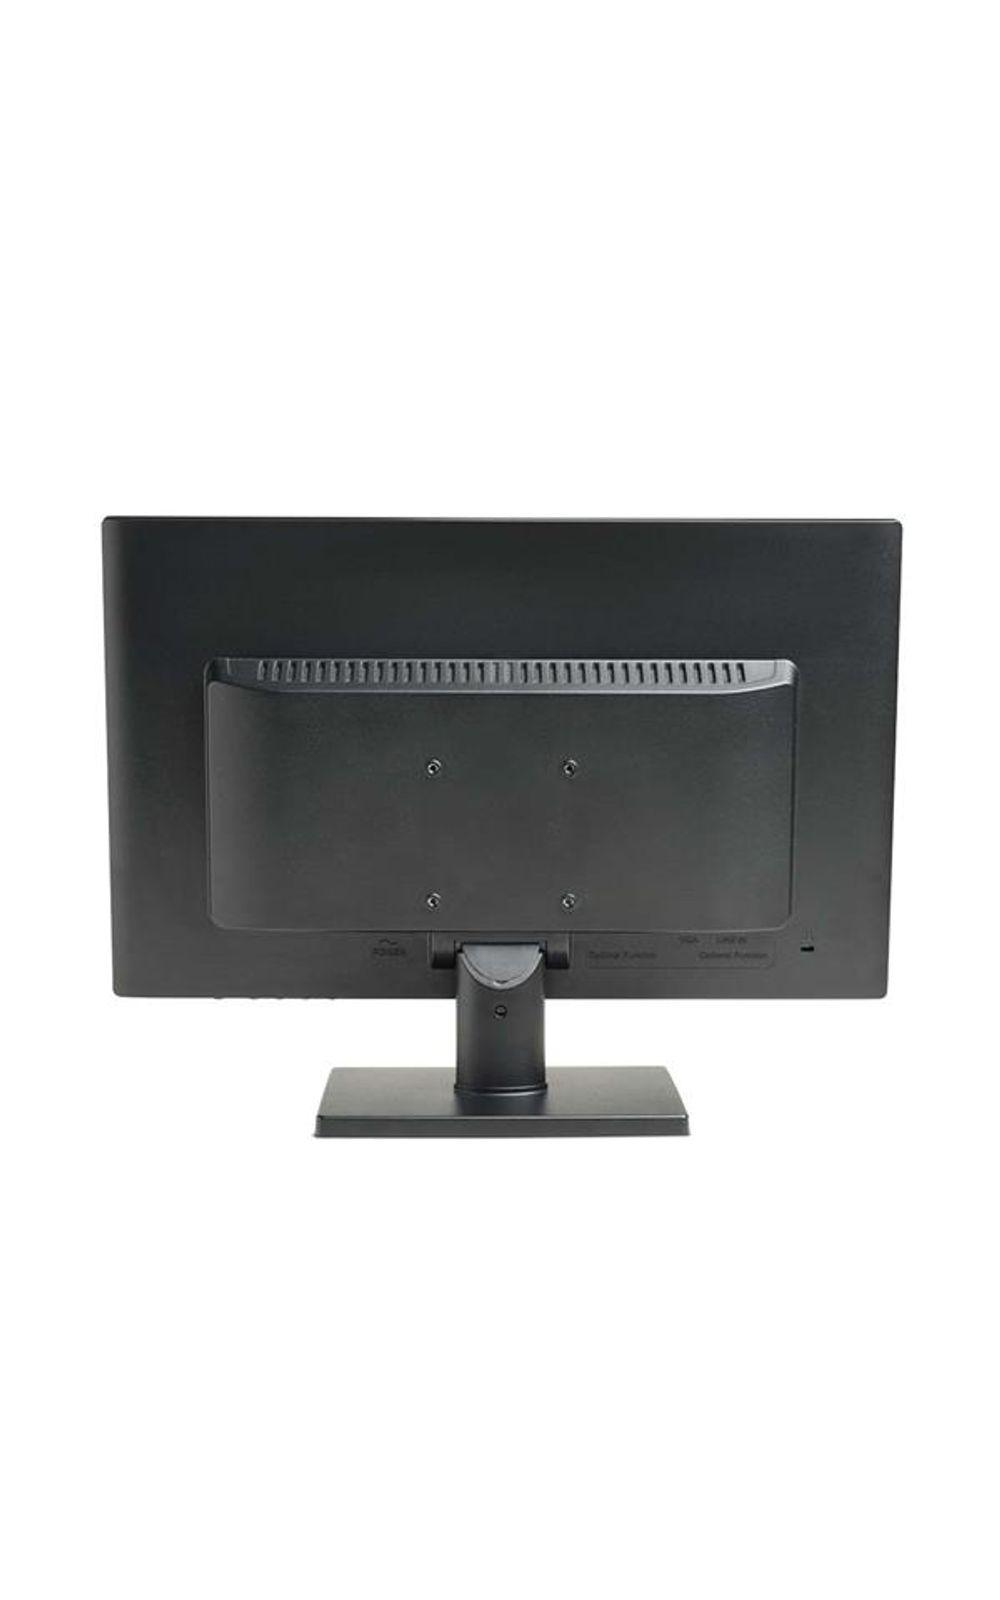 Foto 4 - Computador Multilaser Linux com Monitor 18.5 Pol Preto - DT016